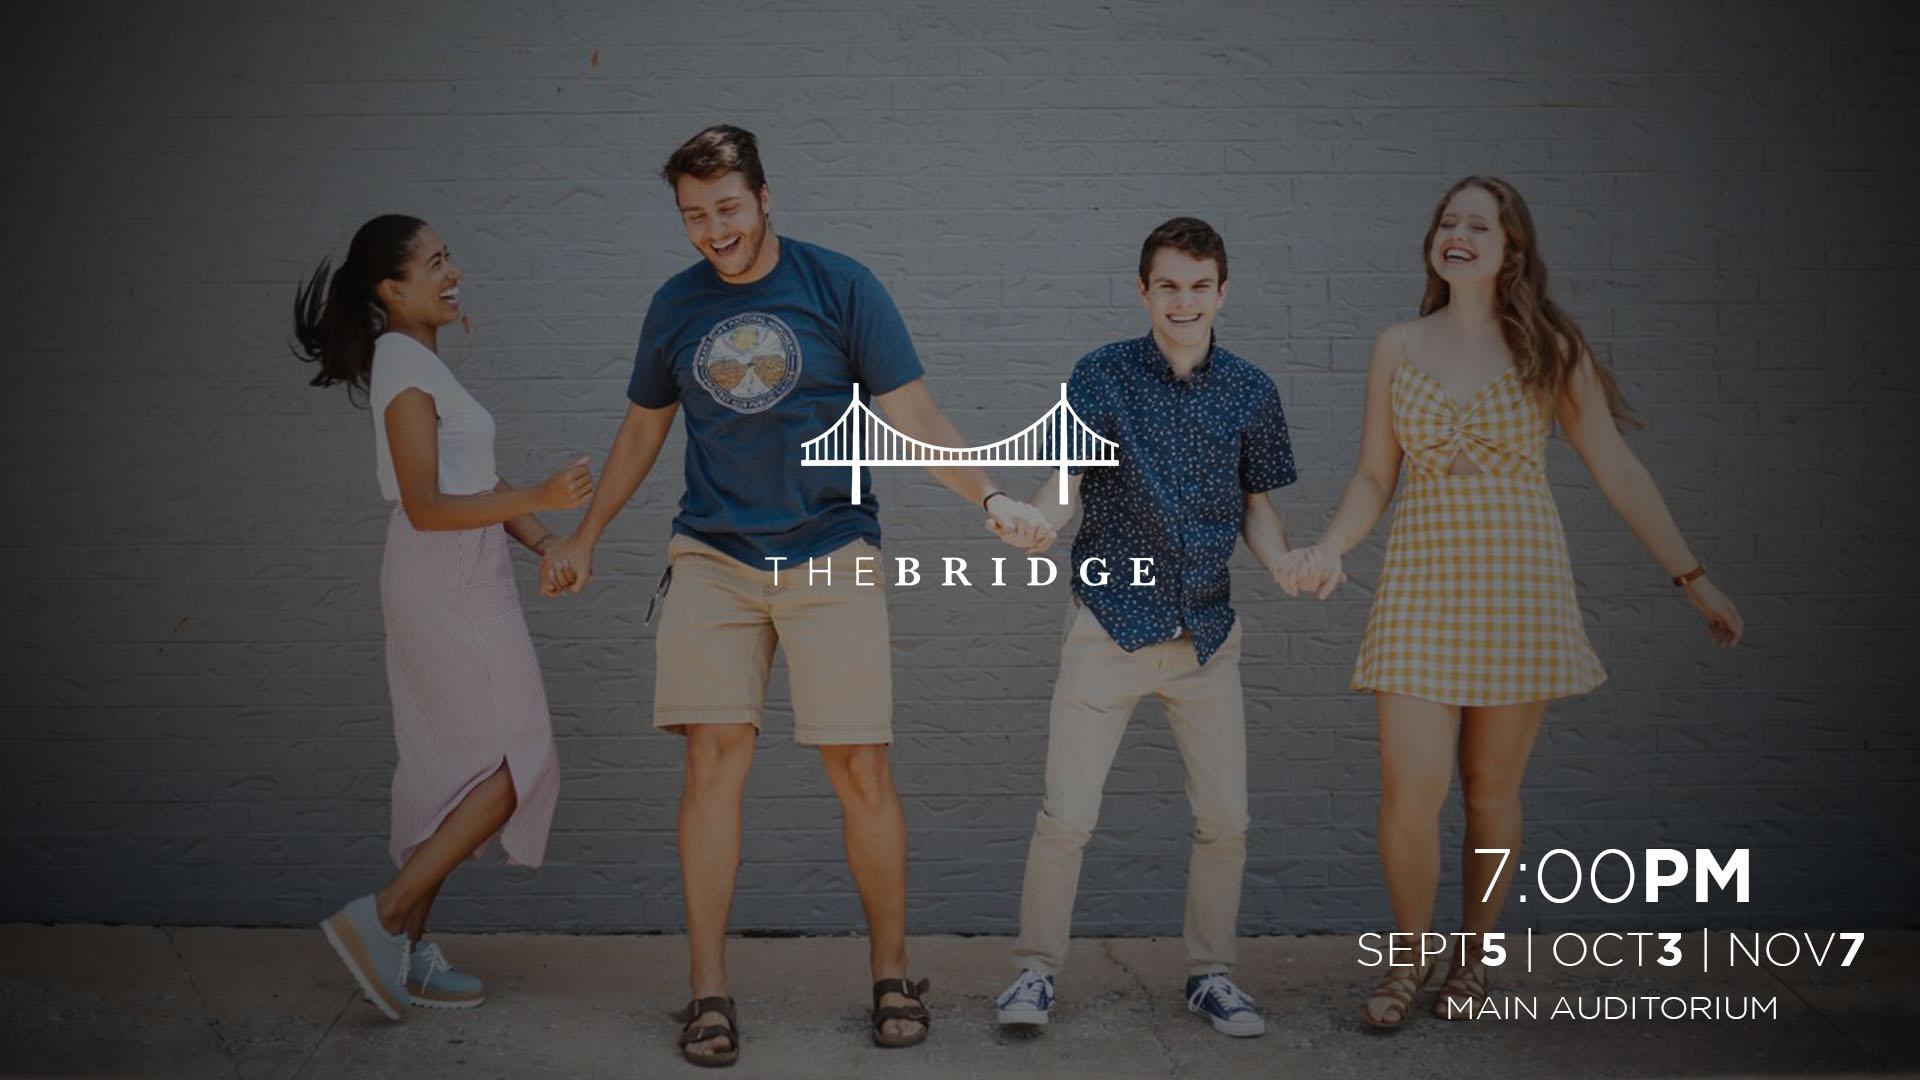 Bridge_Announcement_Draft3b.jpg